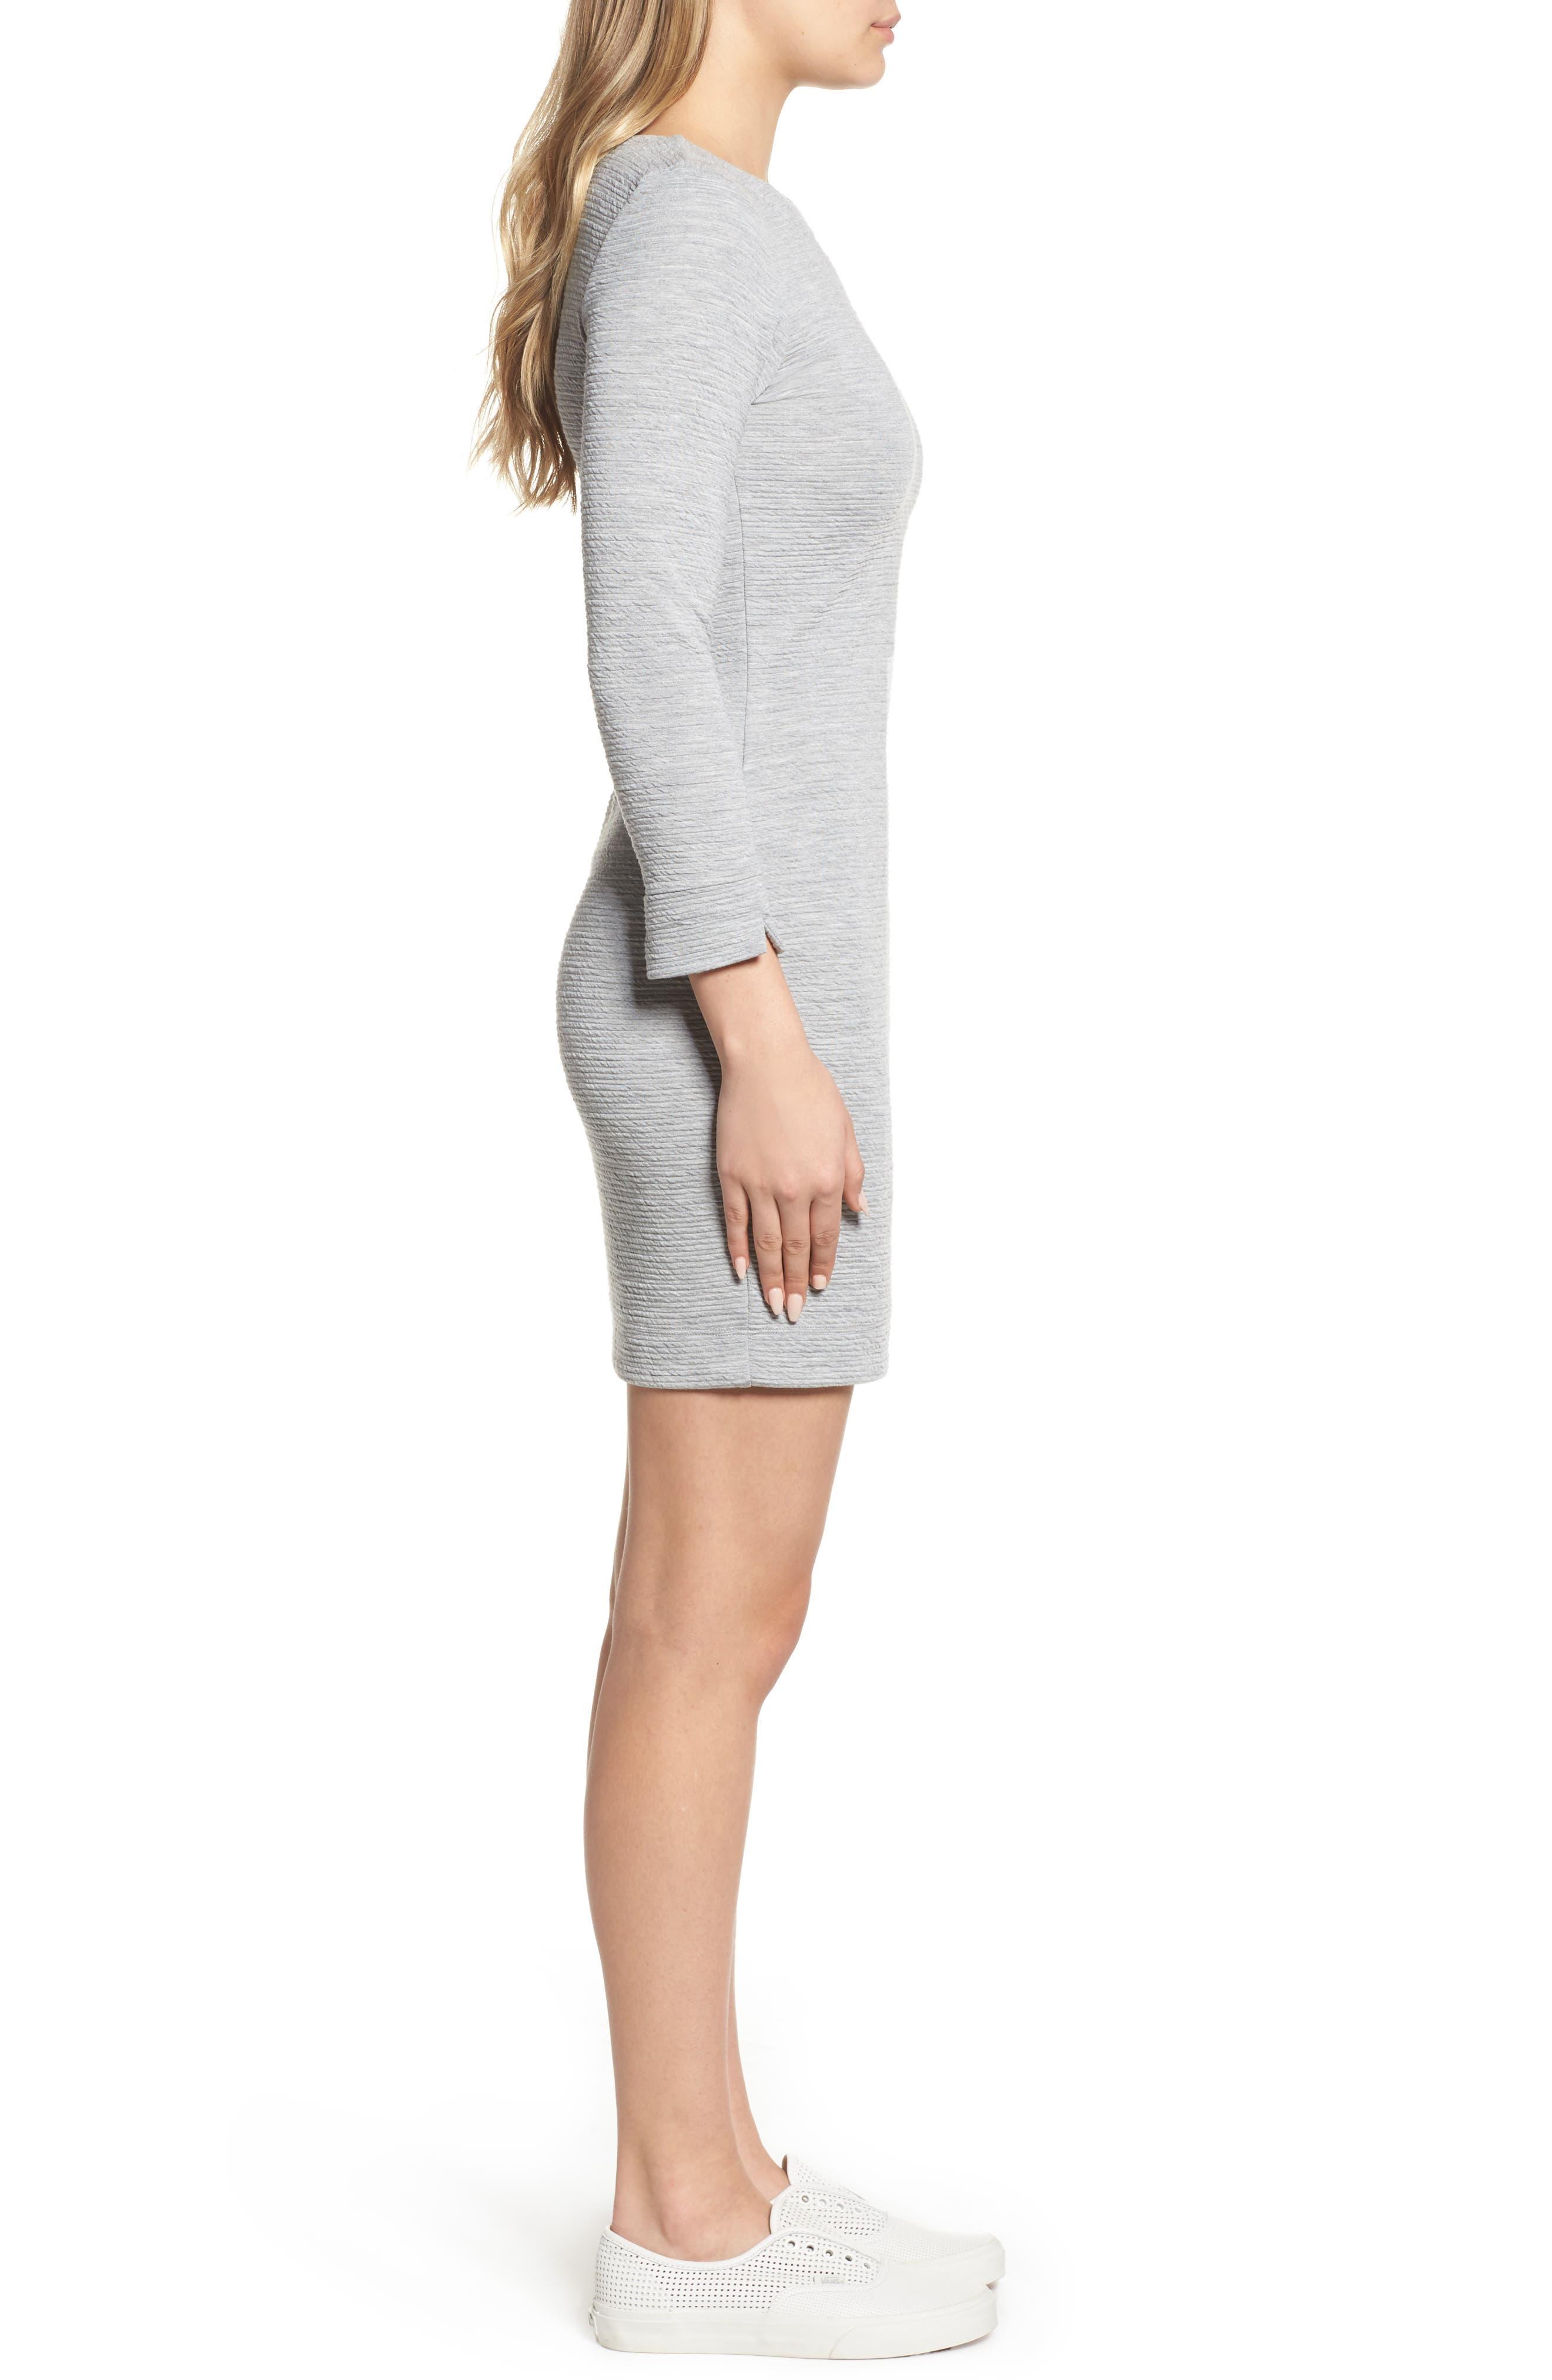 Sudan Marl Sheath Dress,                             Alternate thumbnail 3, color,                             Mid Grey Mel